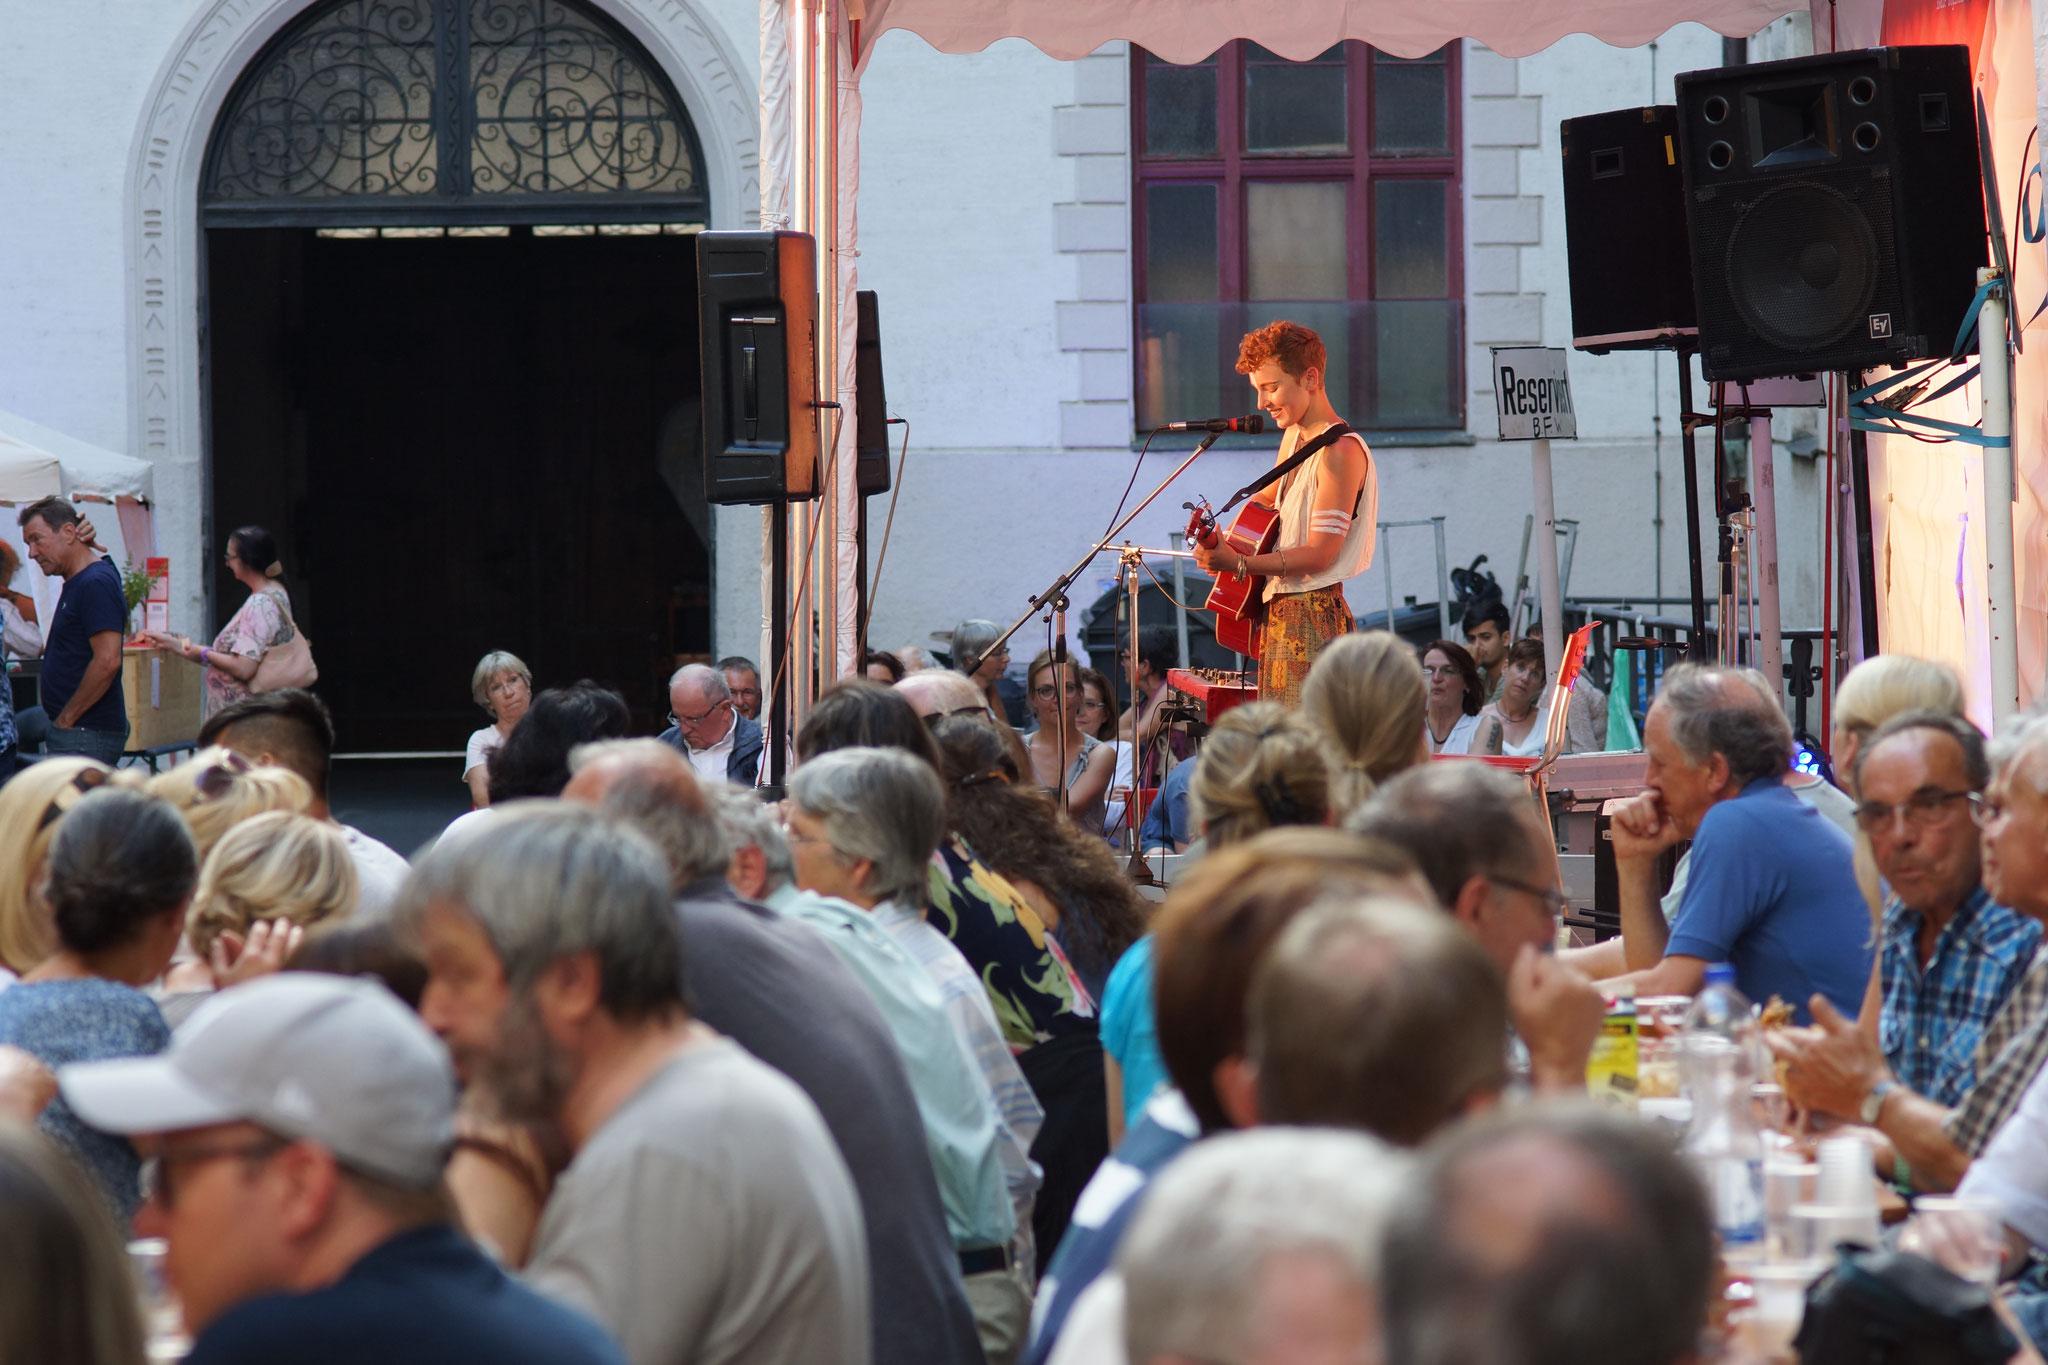 Konzerte im Bürgerhof 06.07.17 Ala Cya - Freiwilligen-Zentrum Augsburg - Foto: Crayfish